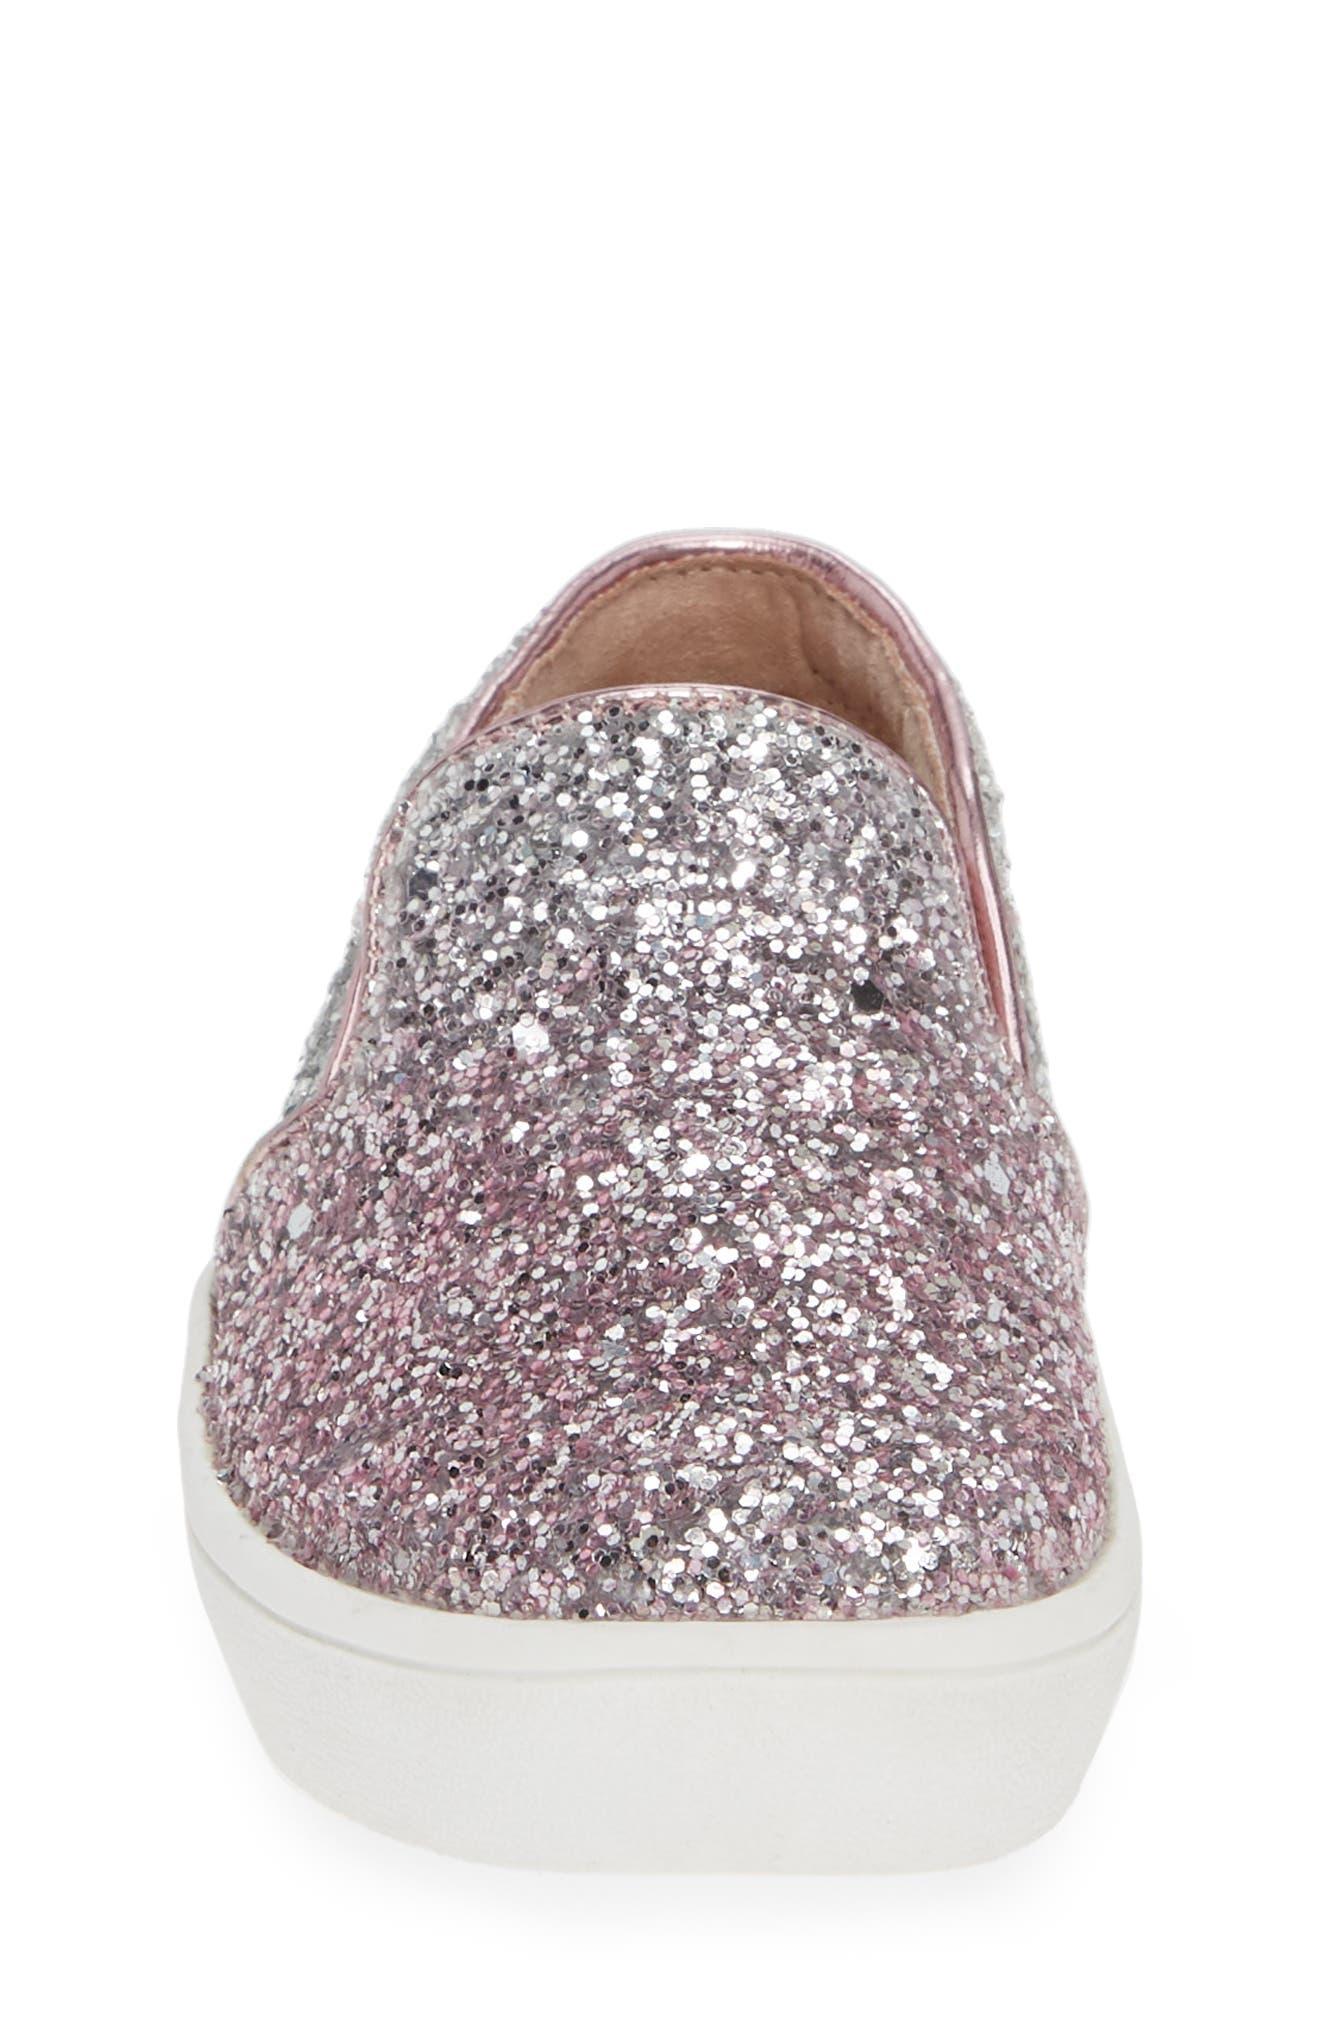 Ivy Ombré Glitter Slip-On Sneaker,                             Alternate thumbnail 4, color,                             PINK SILVER